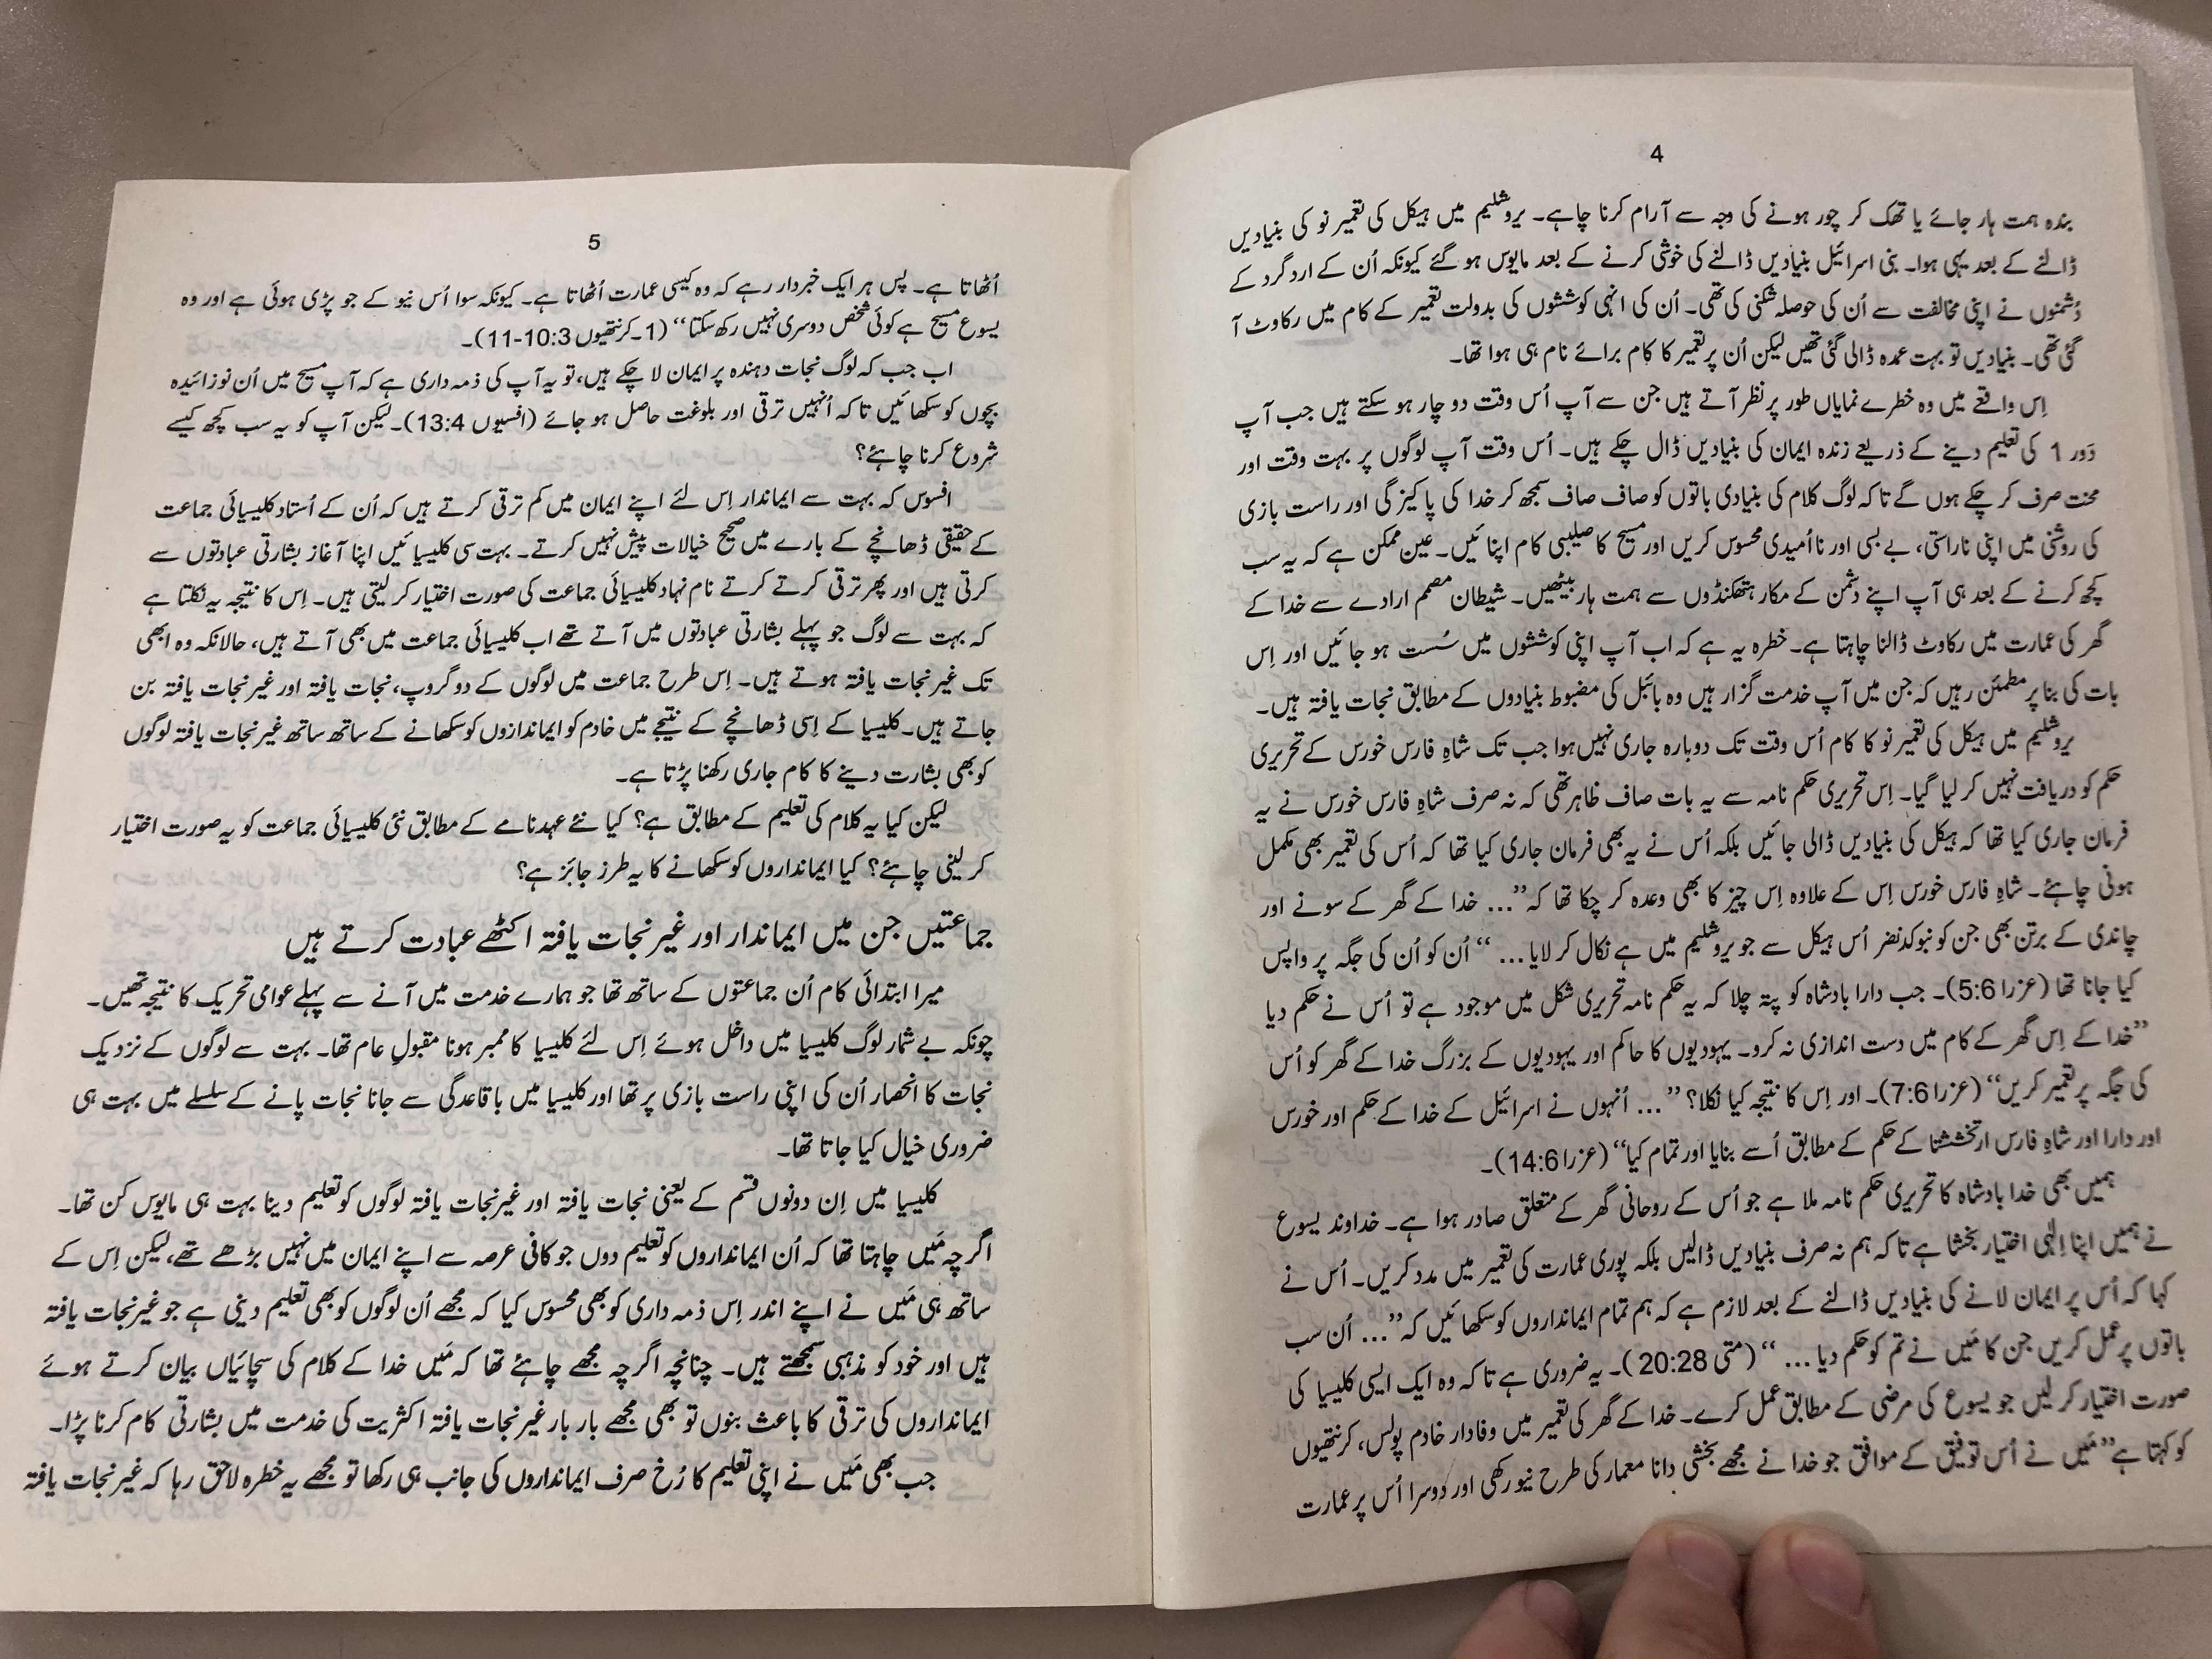 building-on-firm-foundations-vol.3-by-trevor-mcilwain-urdu-edition-evangelism-the-old-testament-pakistan-2007-5-.jpg